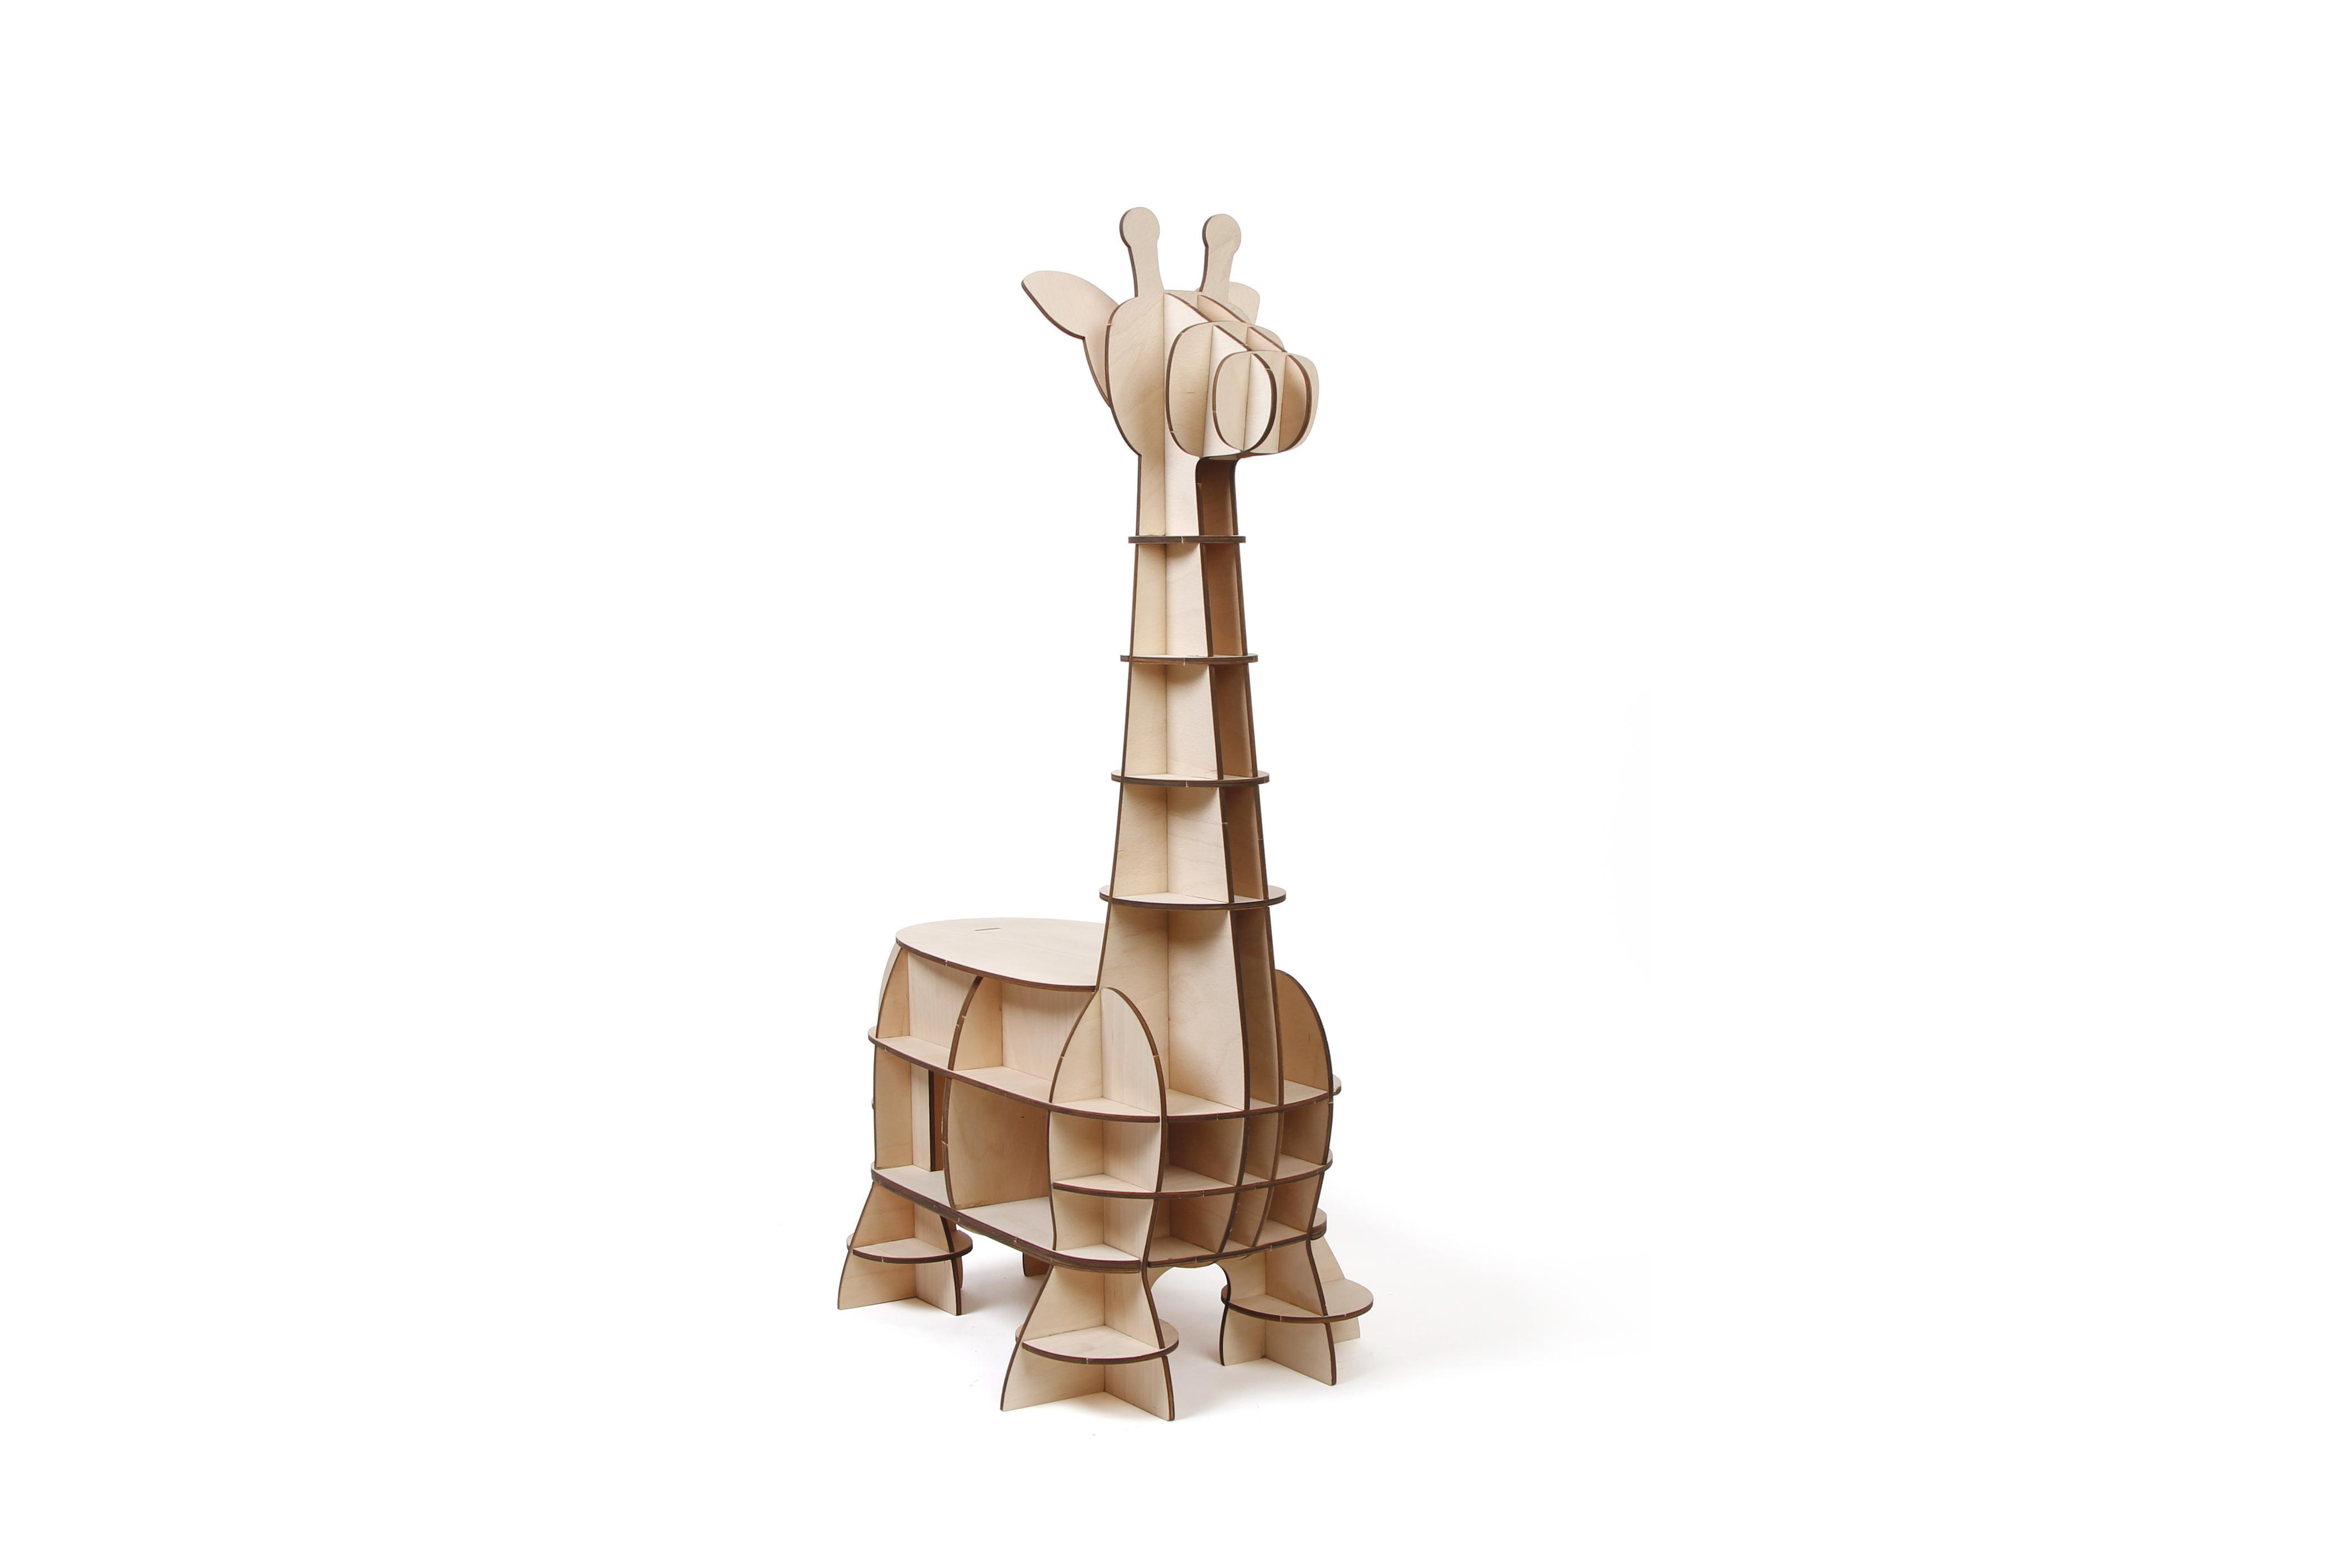 Jigzle Plywood Home- Baby Giraffe Chair